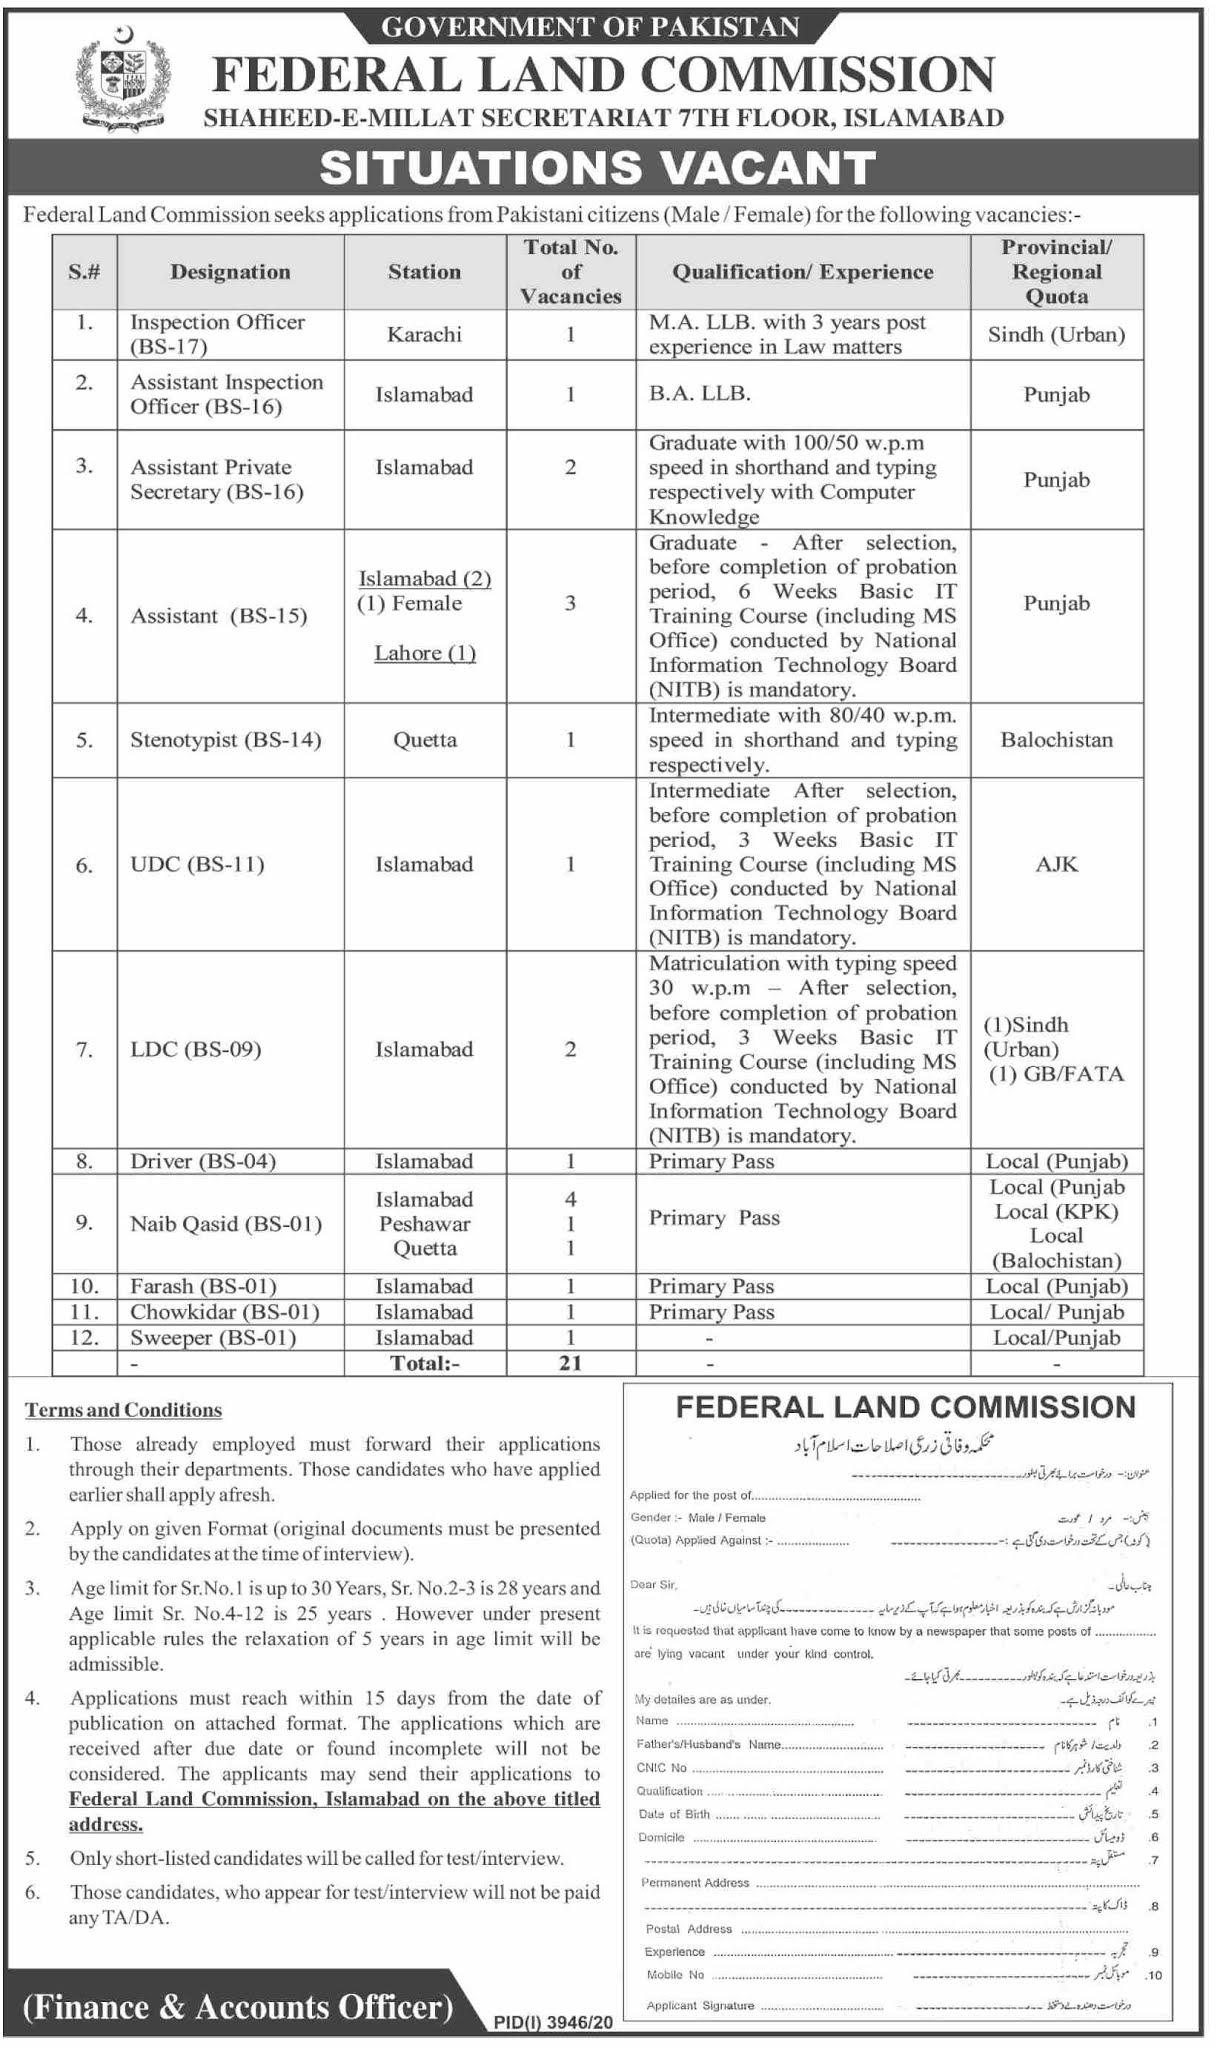 Download Govt Jobs 2021 Application Form - Federal Land Commission Jobs 2021 - Latest Govt Jobs 2021